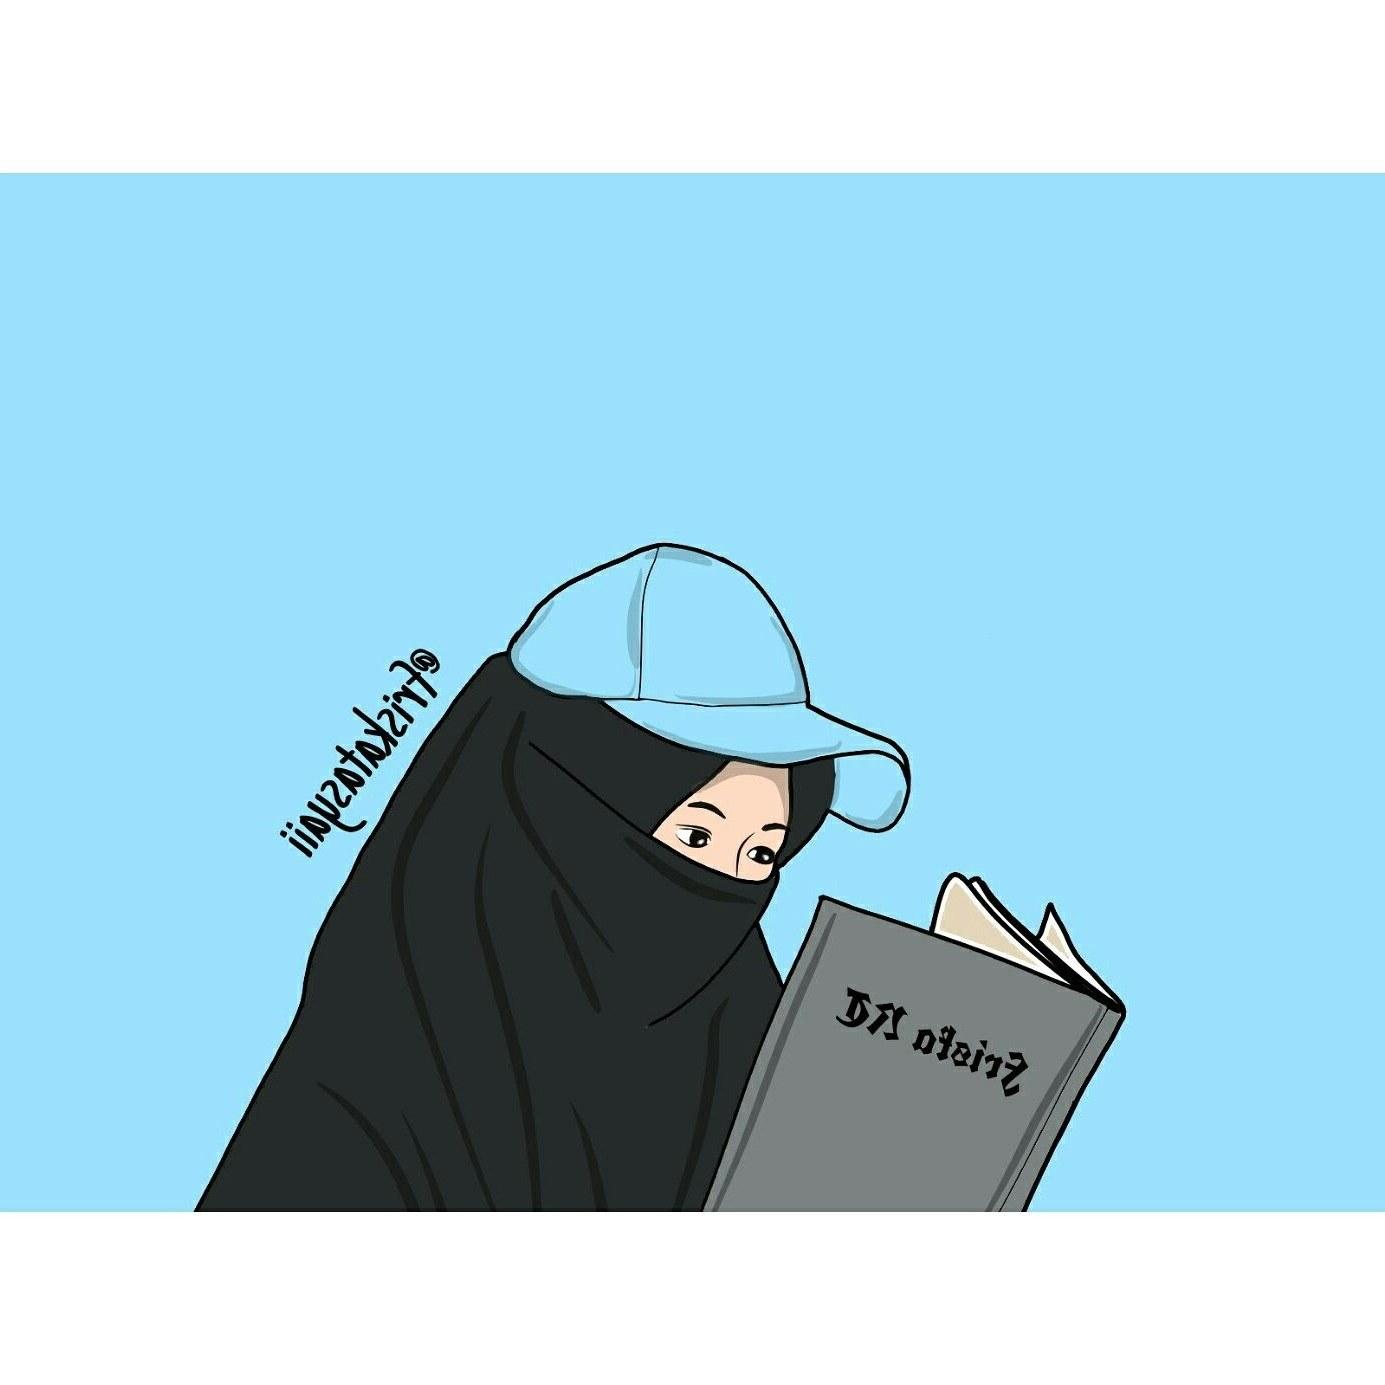 Design Muslimah Bercadar Cantik 9ddf Gambar Kartun Muslimah Modern Cari Gambar Keren Hd